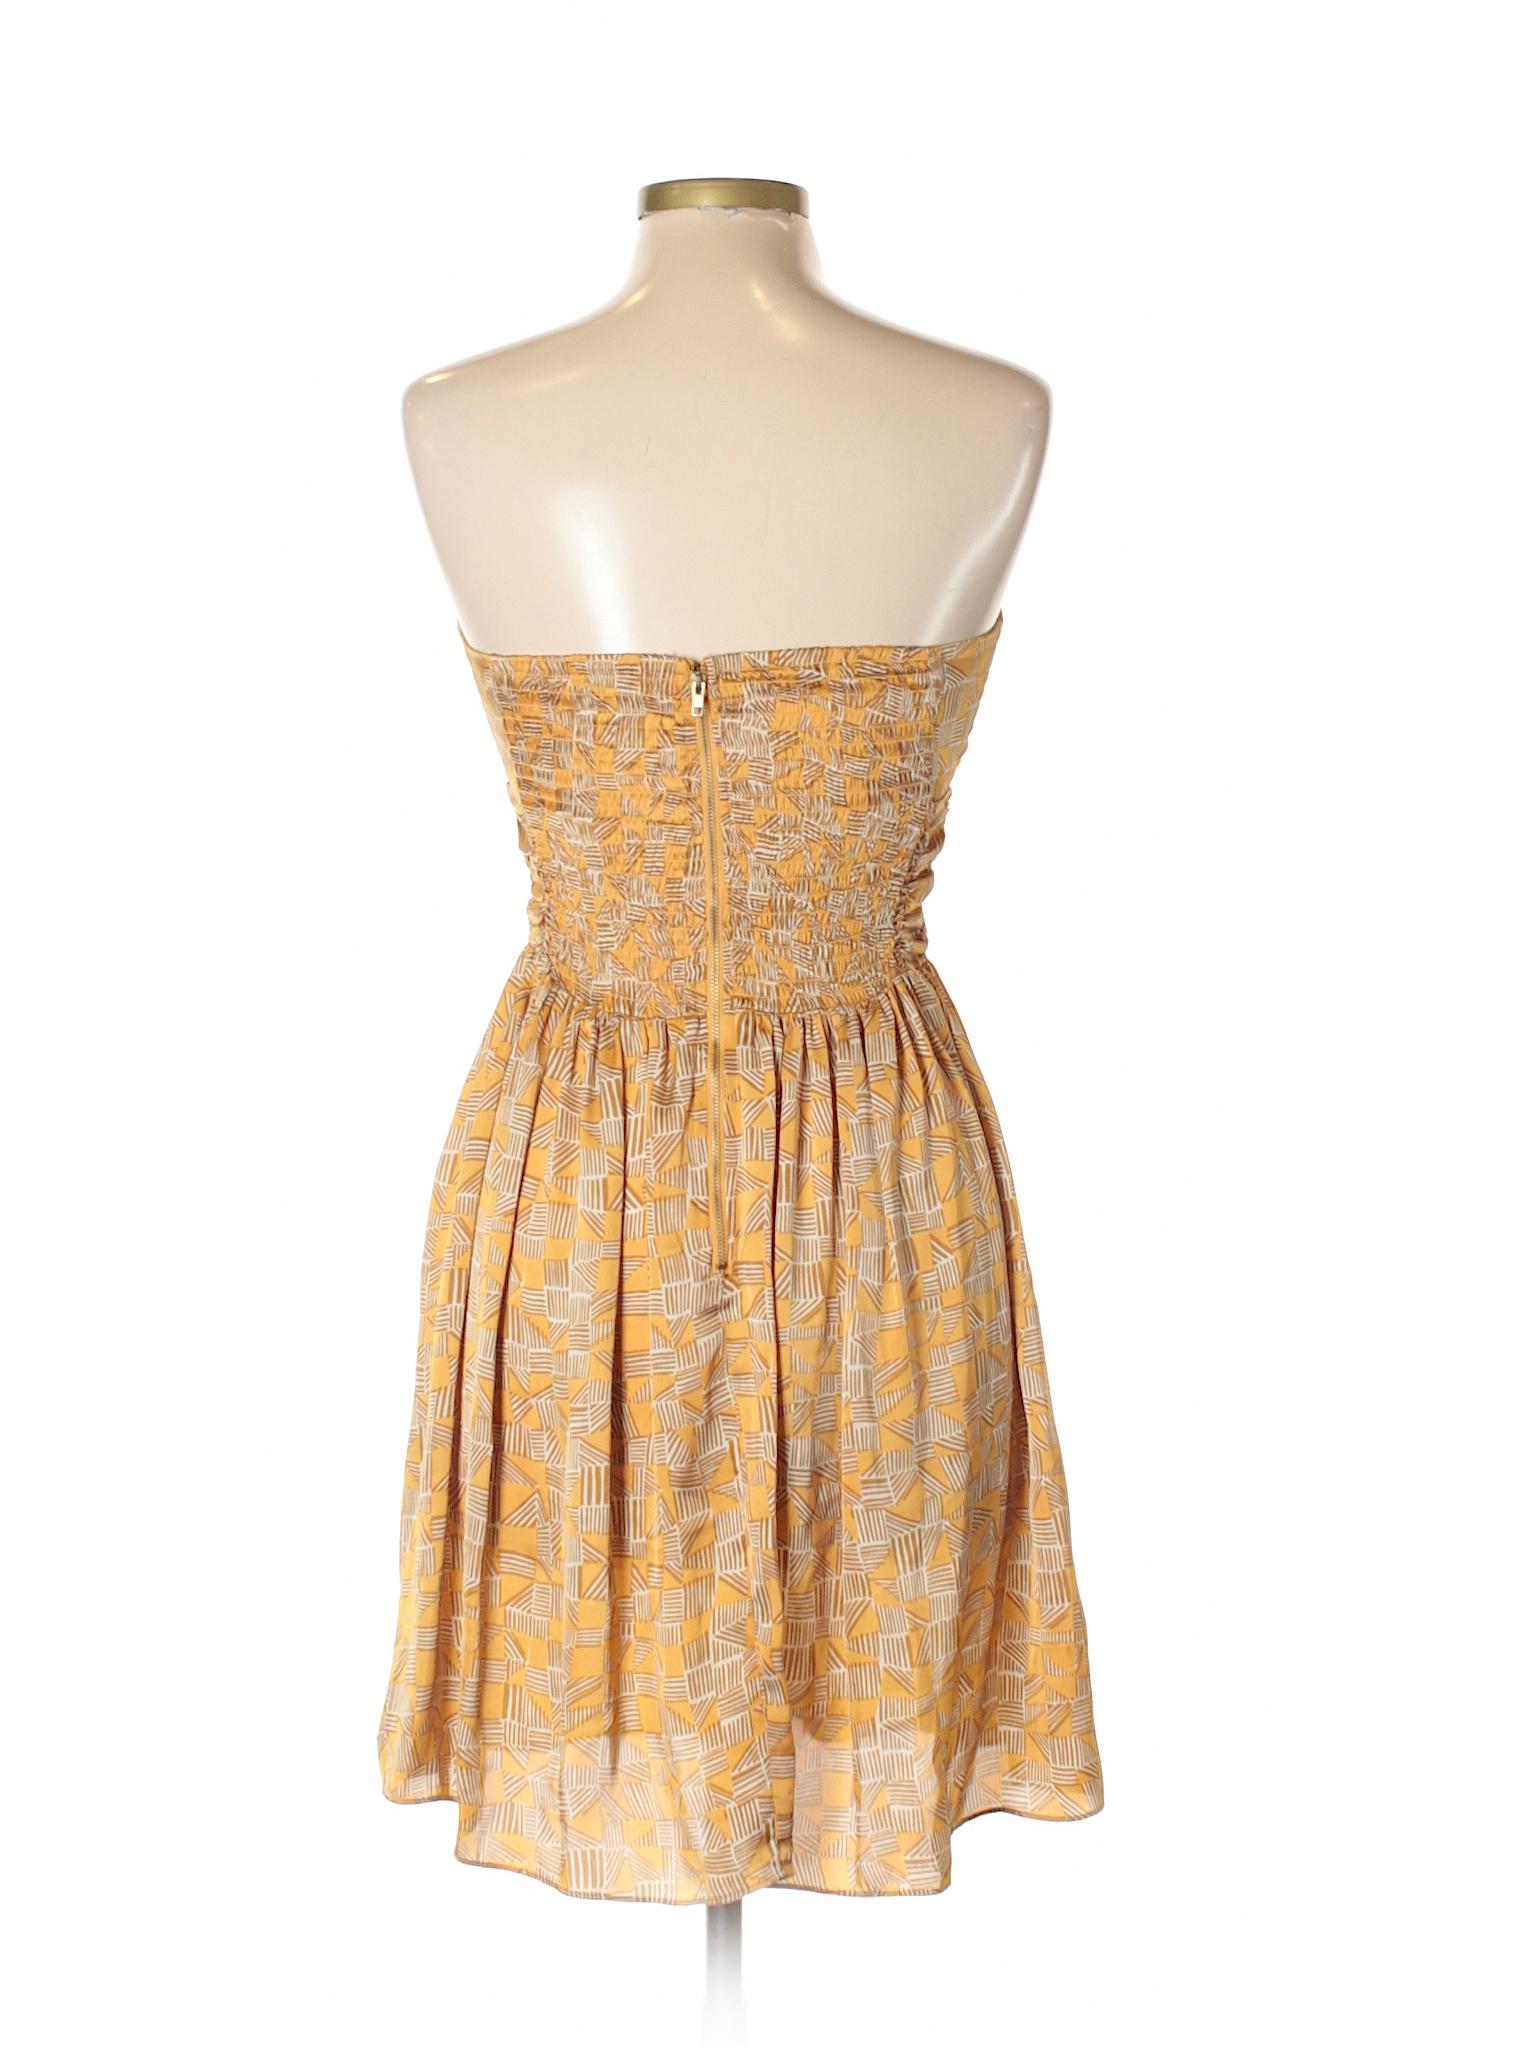 Dress Selling Selling Casual Bar Bar III wXg1vFpq